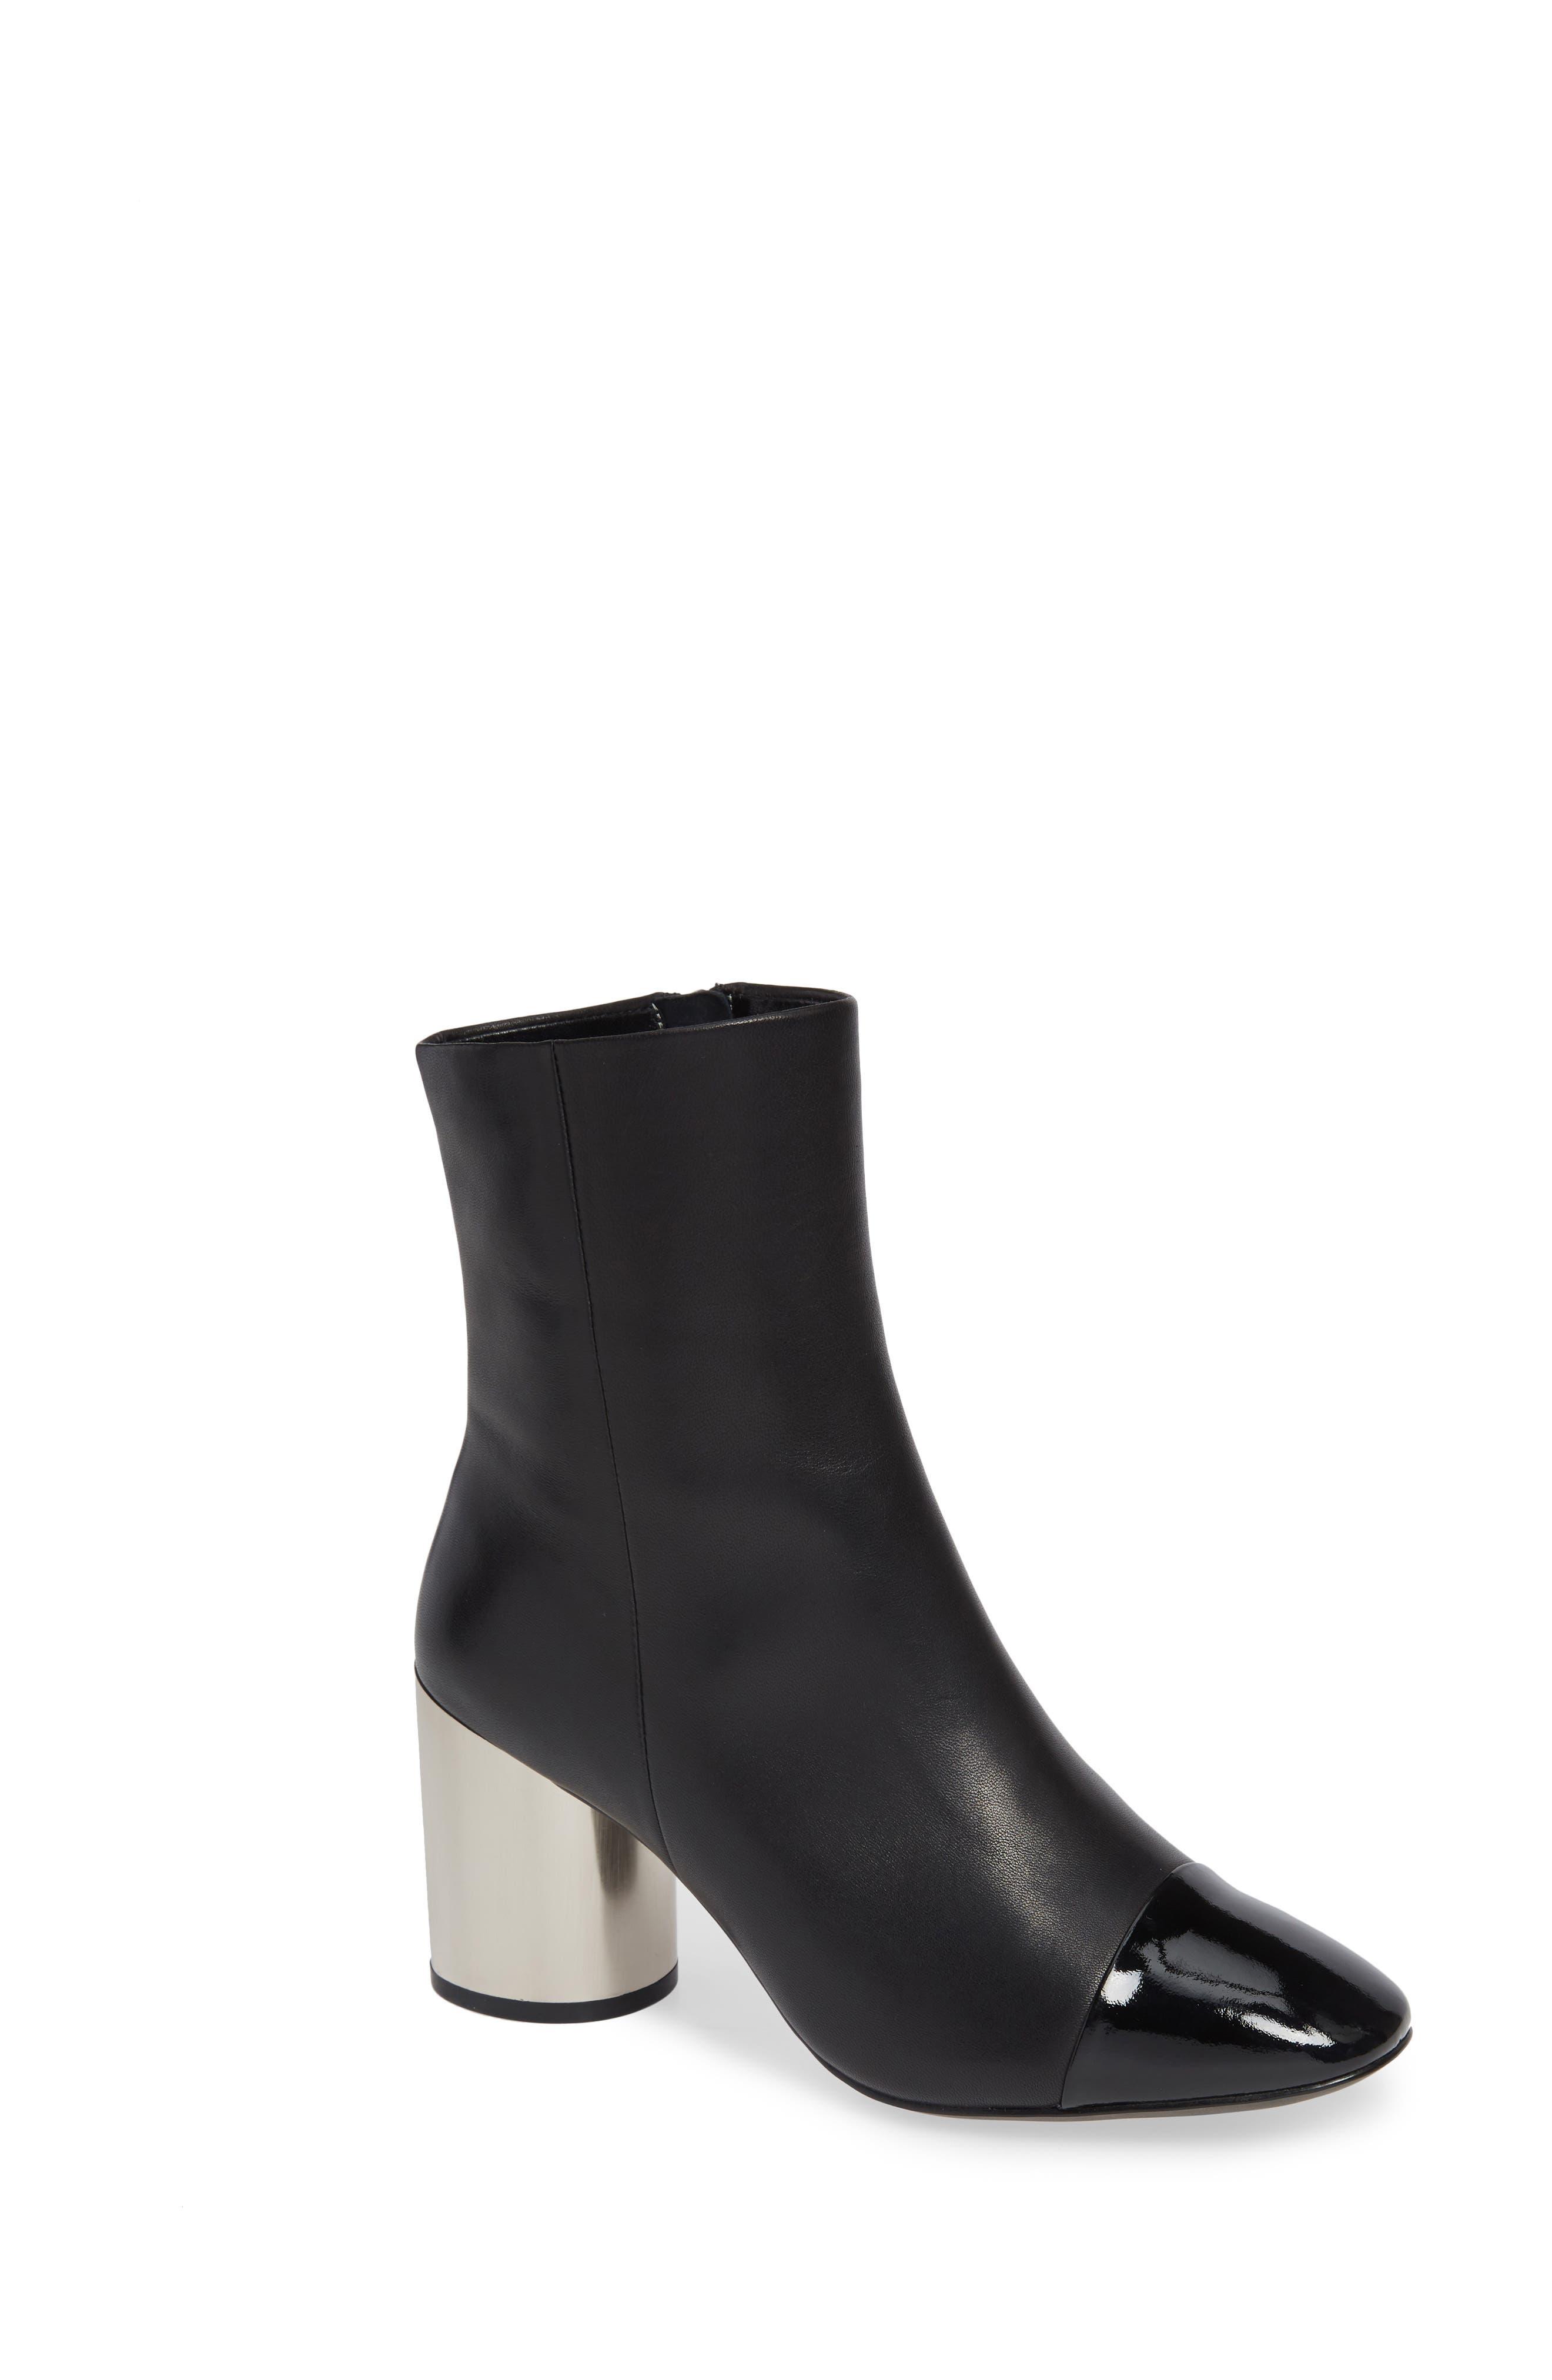 Linea Paolo Stella Cap Toe Bootie- Black